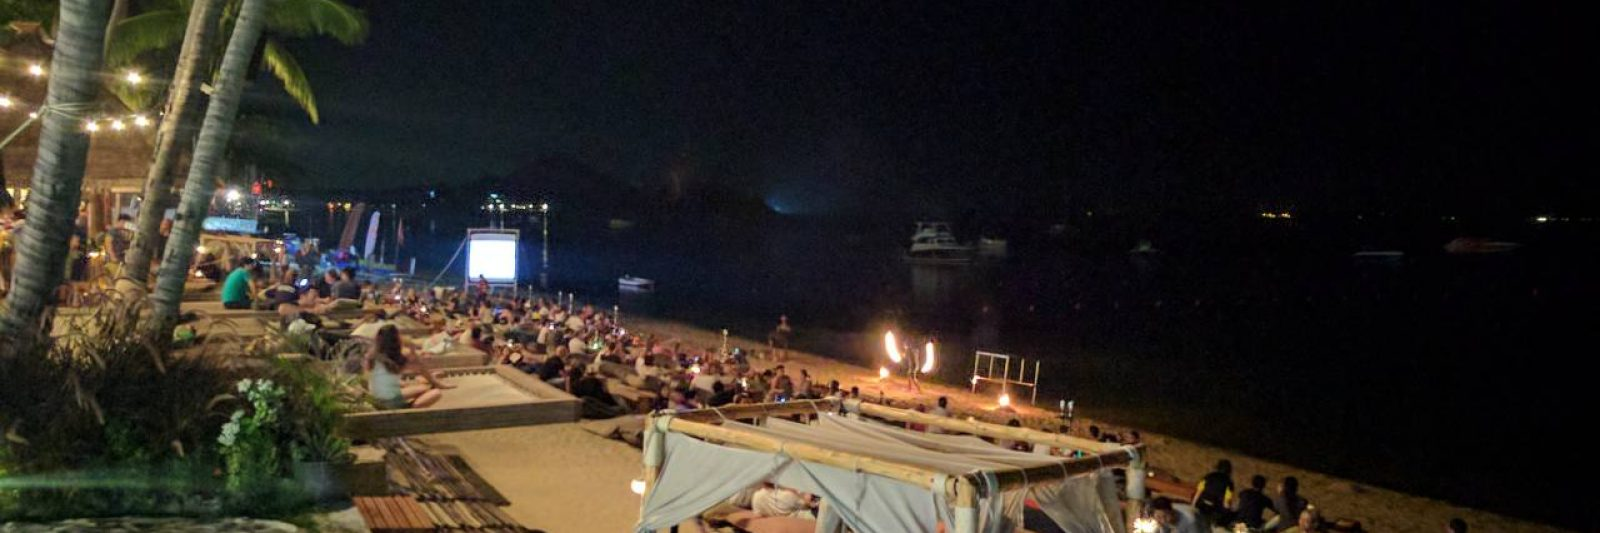 Fisherman's Village at night